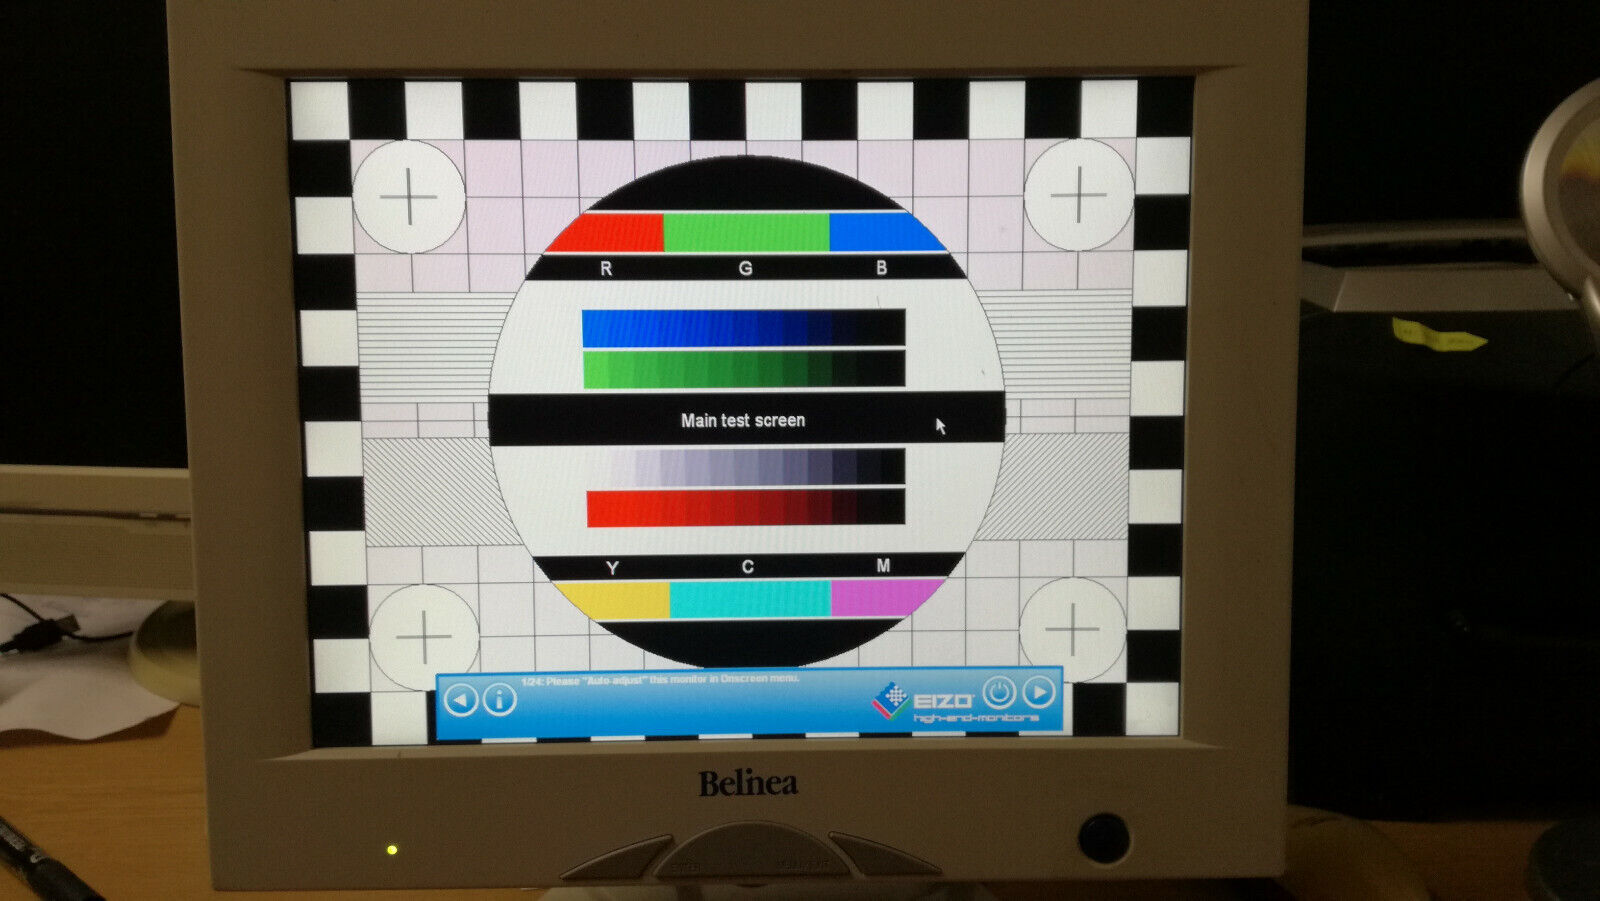 Maxdata Belinea 15-Zoll Monitor 10 15 45 VGA, Top in Ordnung